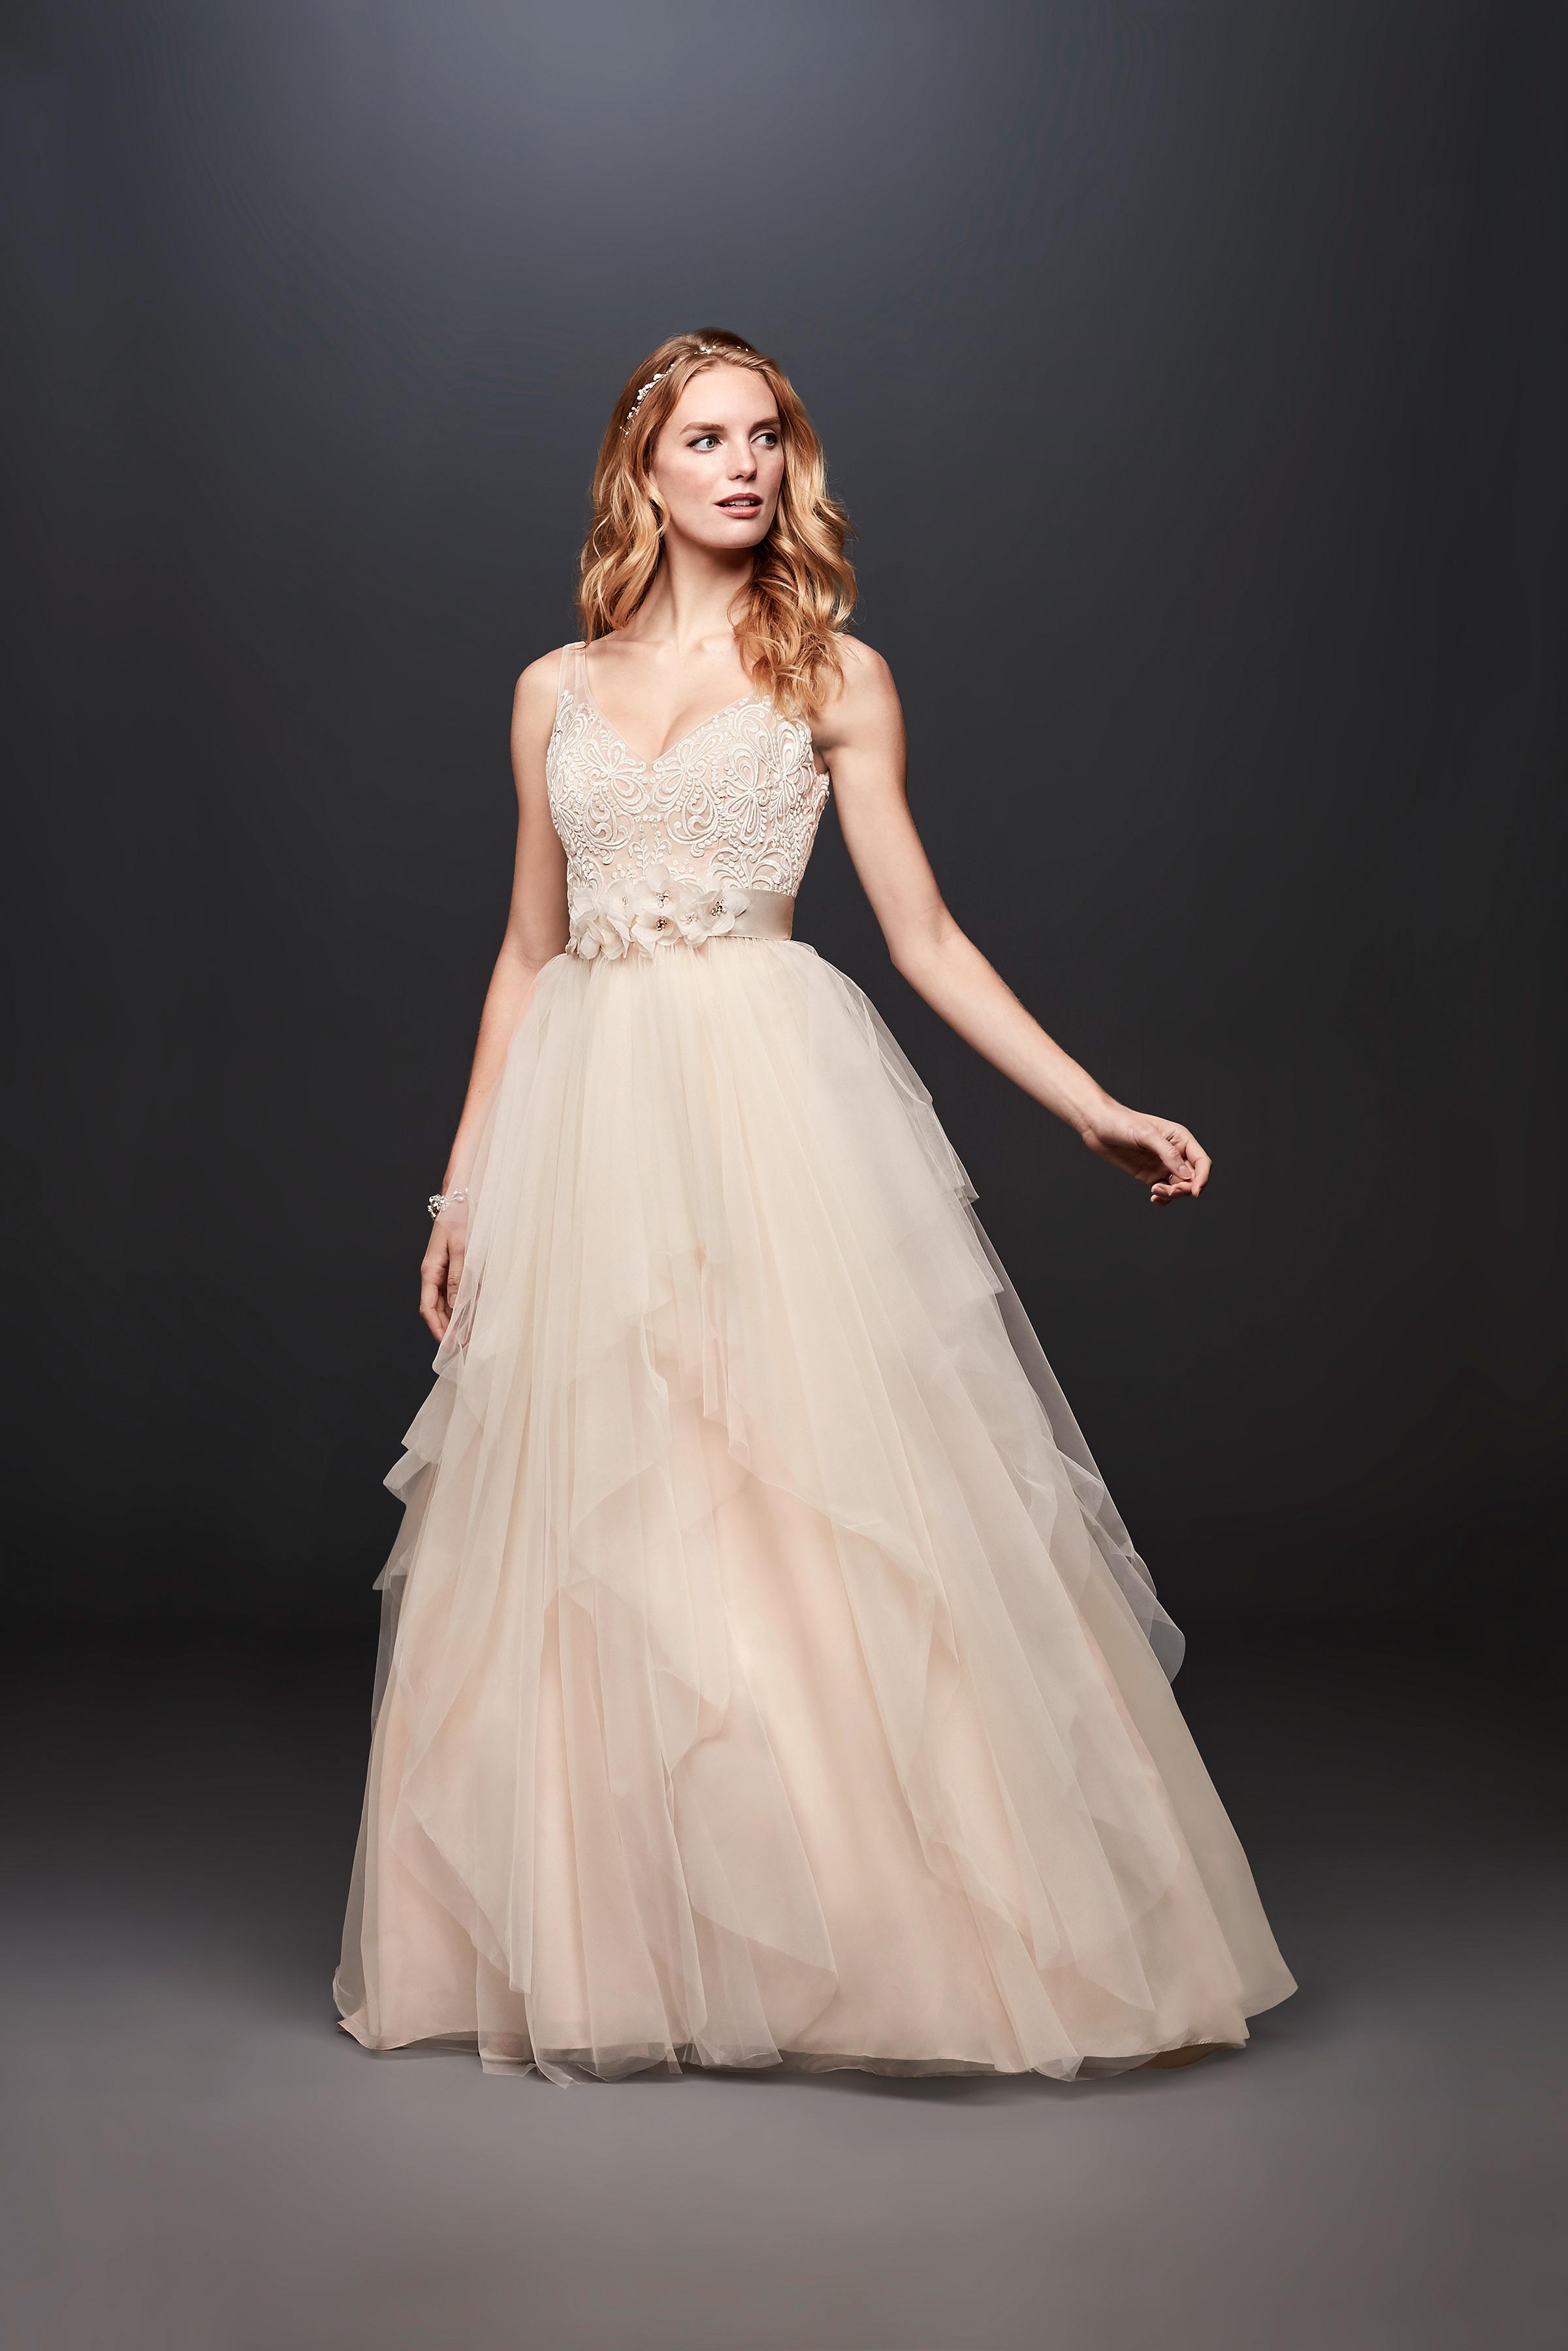 david bridal wedding dress spring 2019 sleeveless a-line tulle